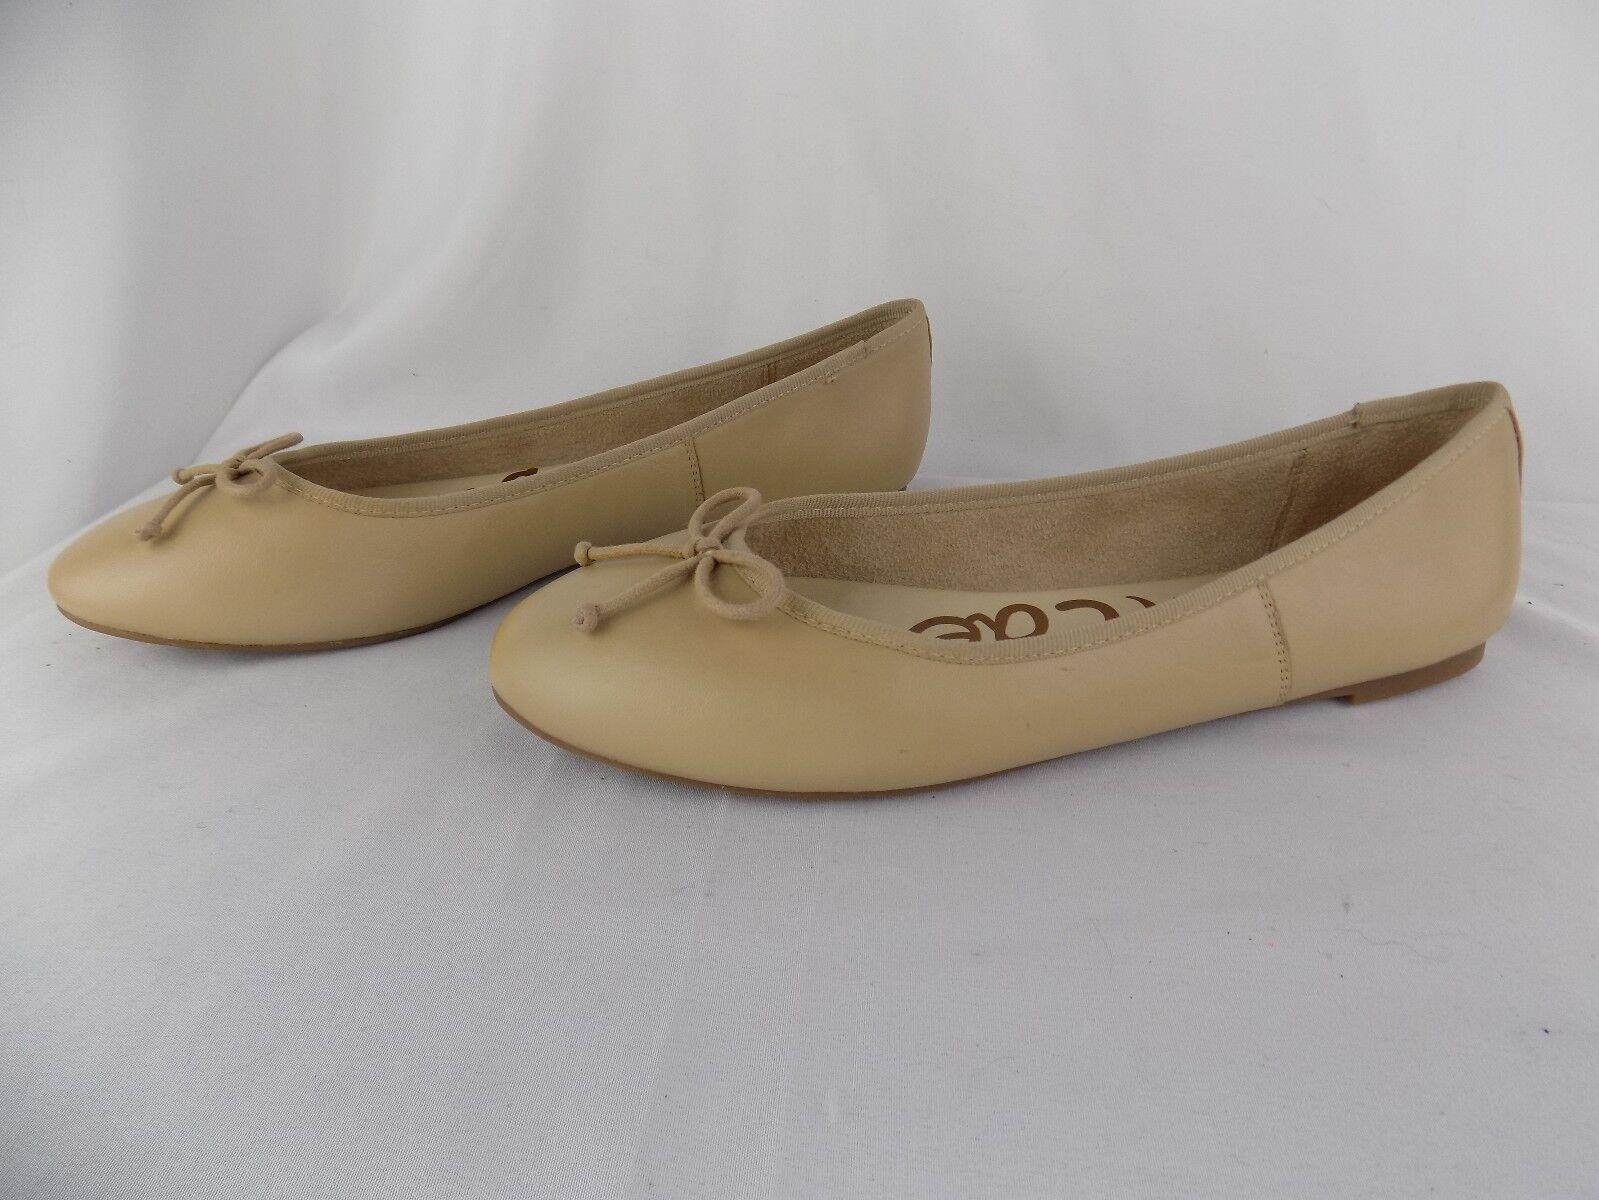 Sam Edelman Women's Carrie Ballet Flat Slip On shoes Nude Sz 10